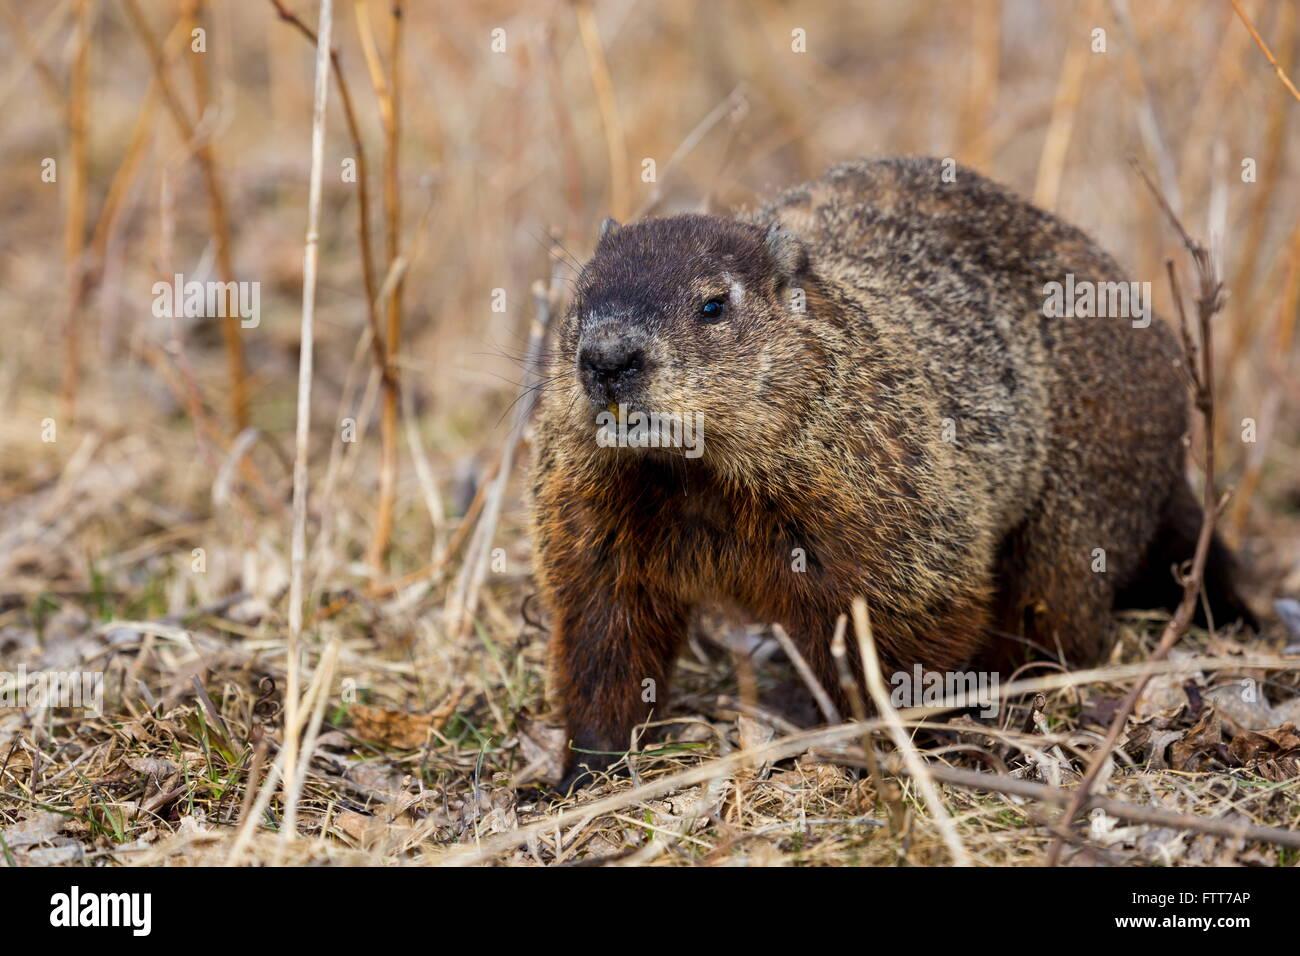 groundhog or woodchuck stock photo royalty free image 101336222